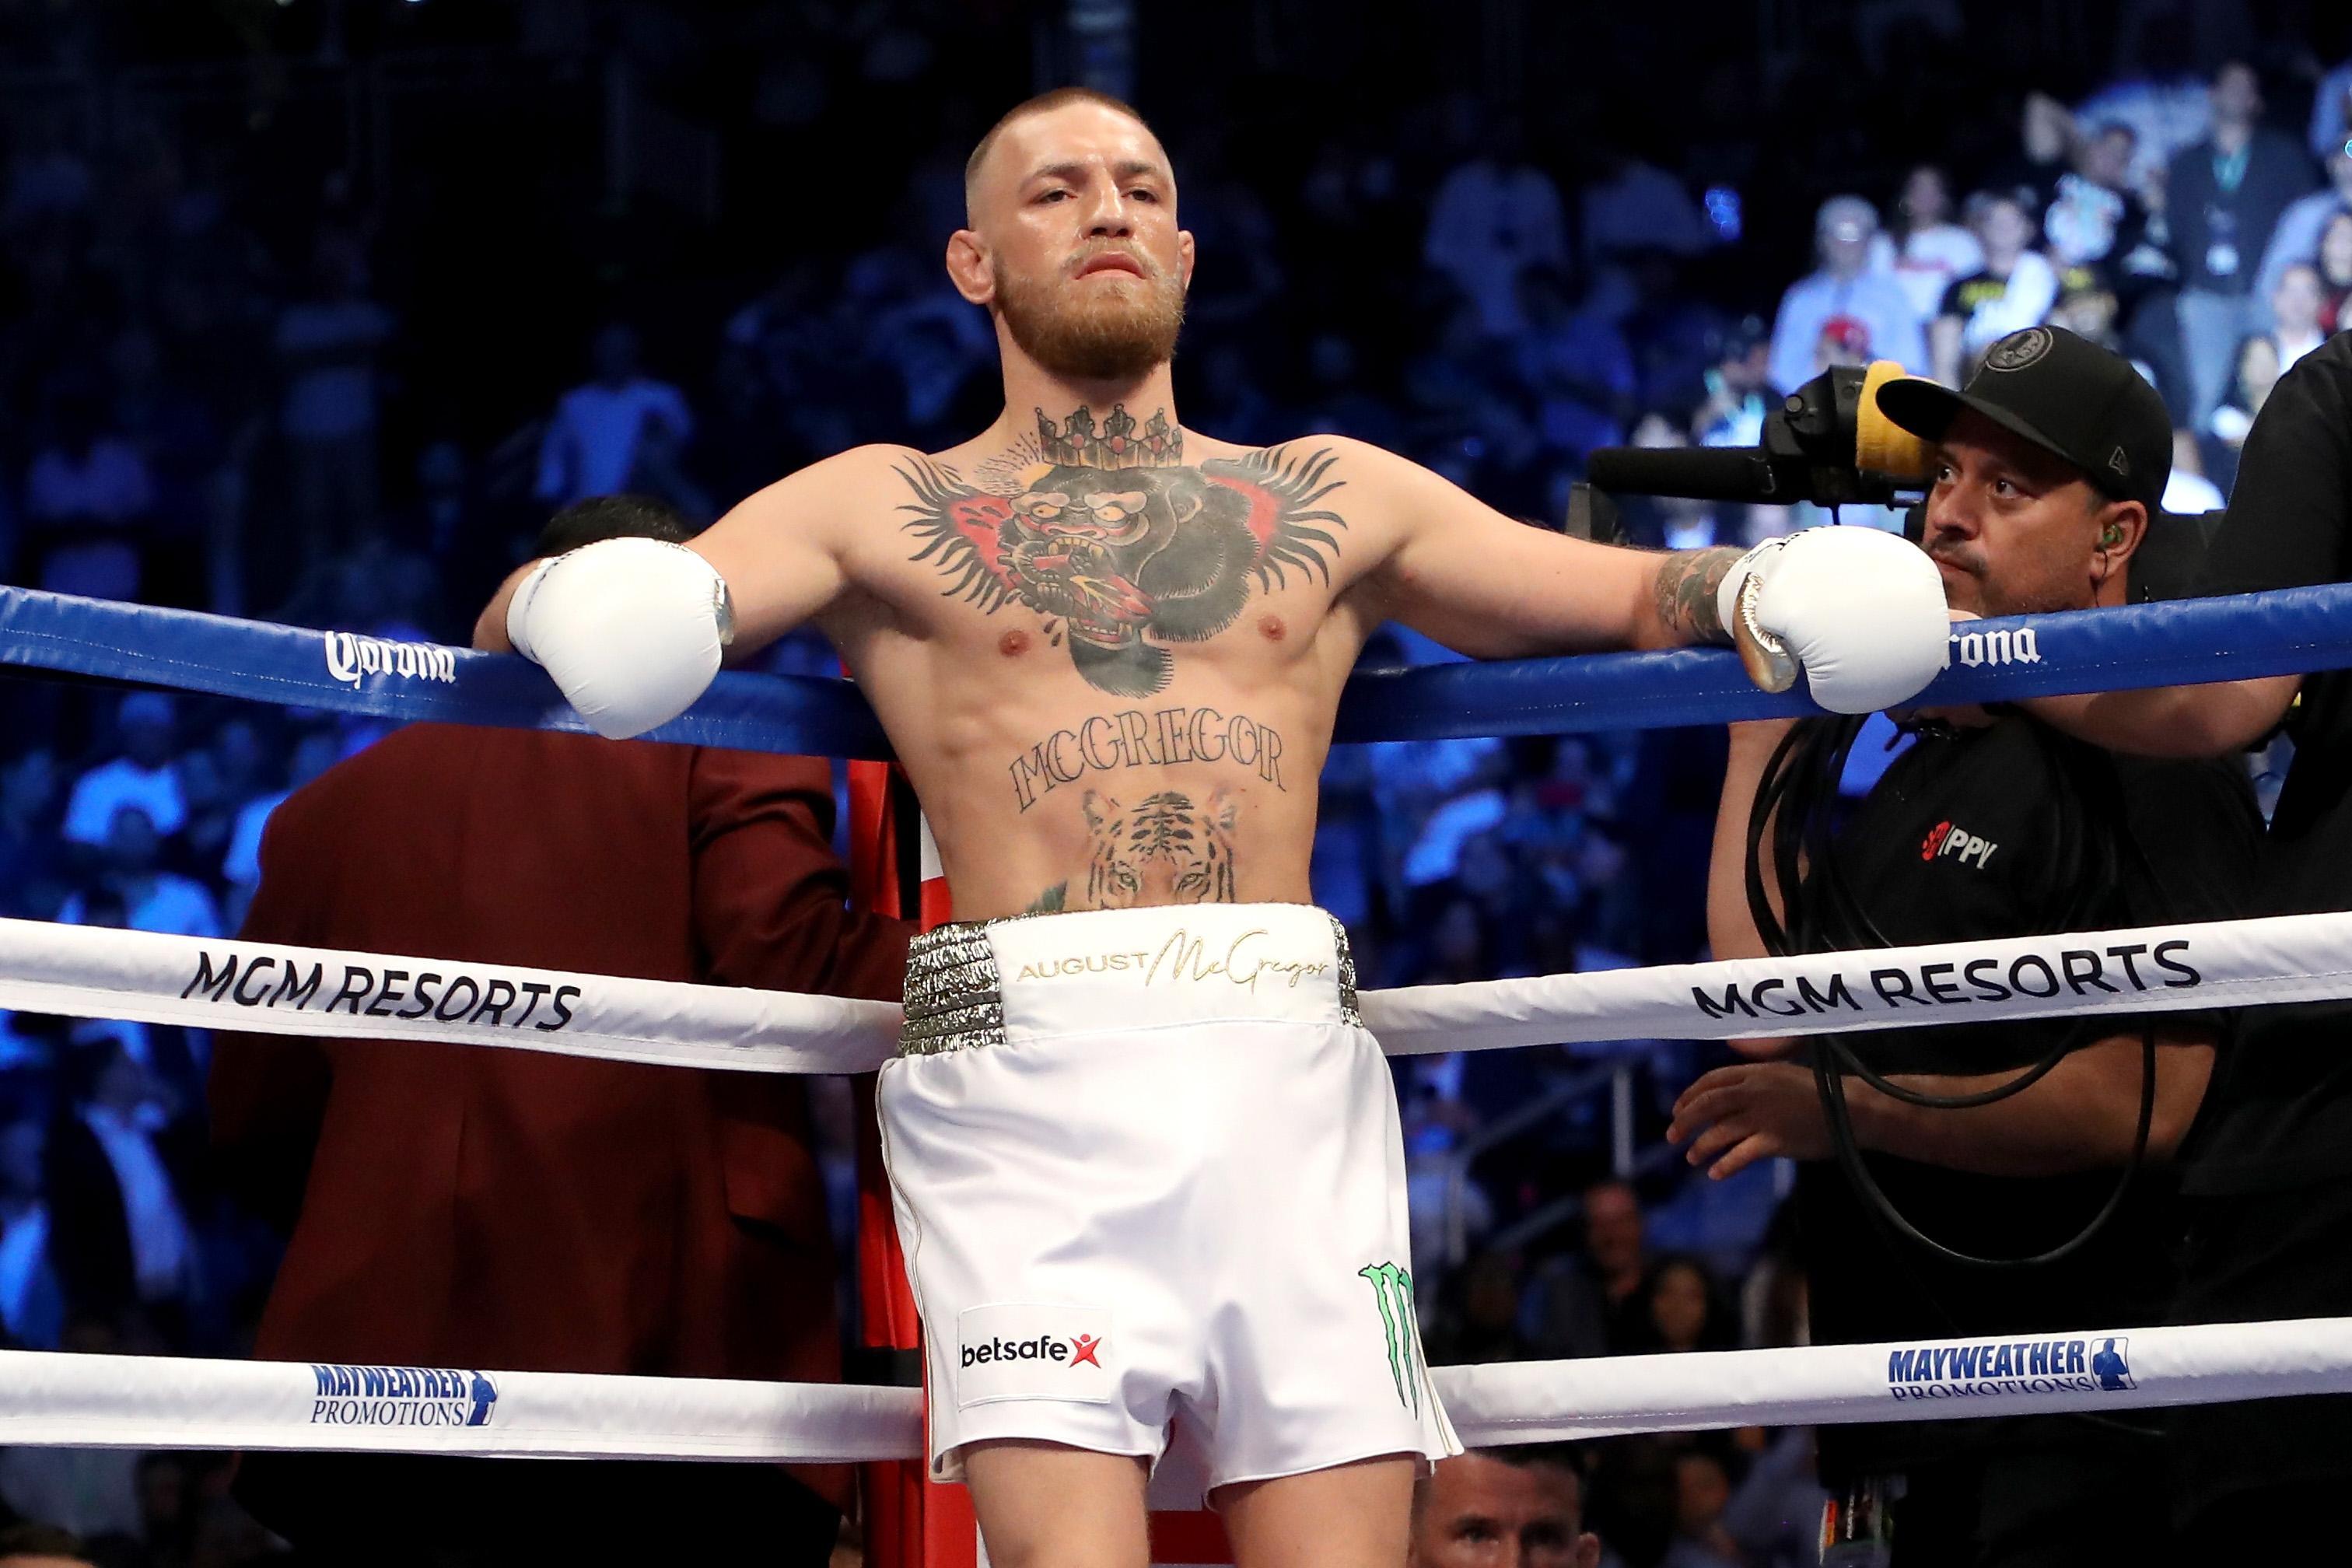 McGregor is preparing to make his UFC comeback on October 6